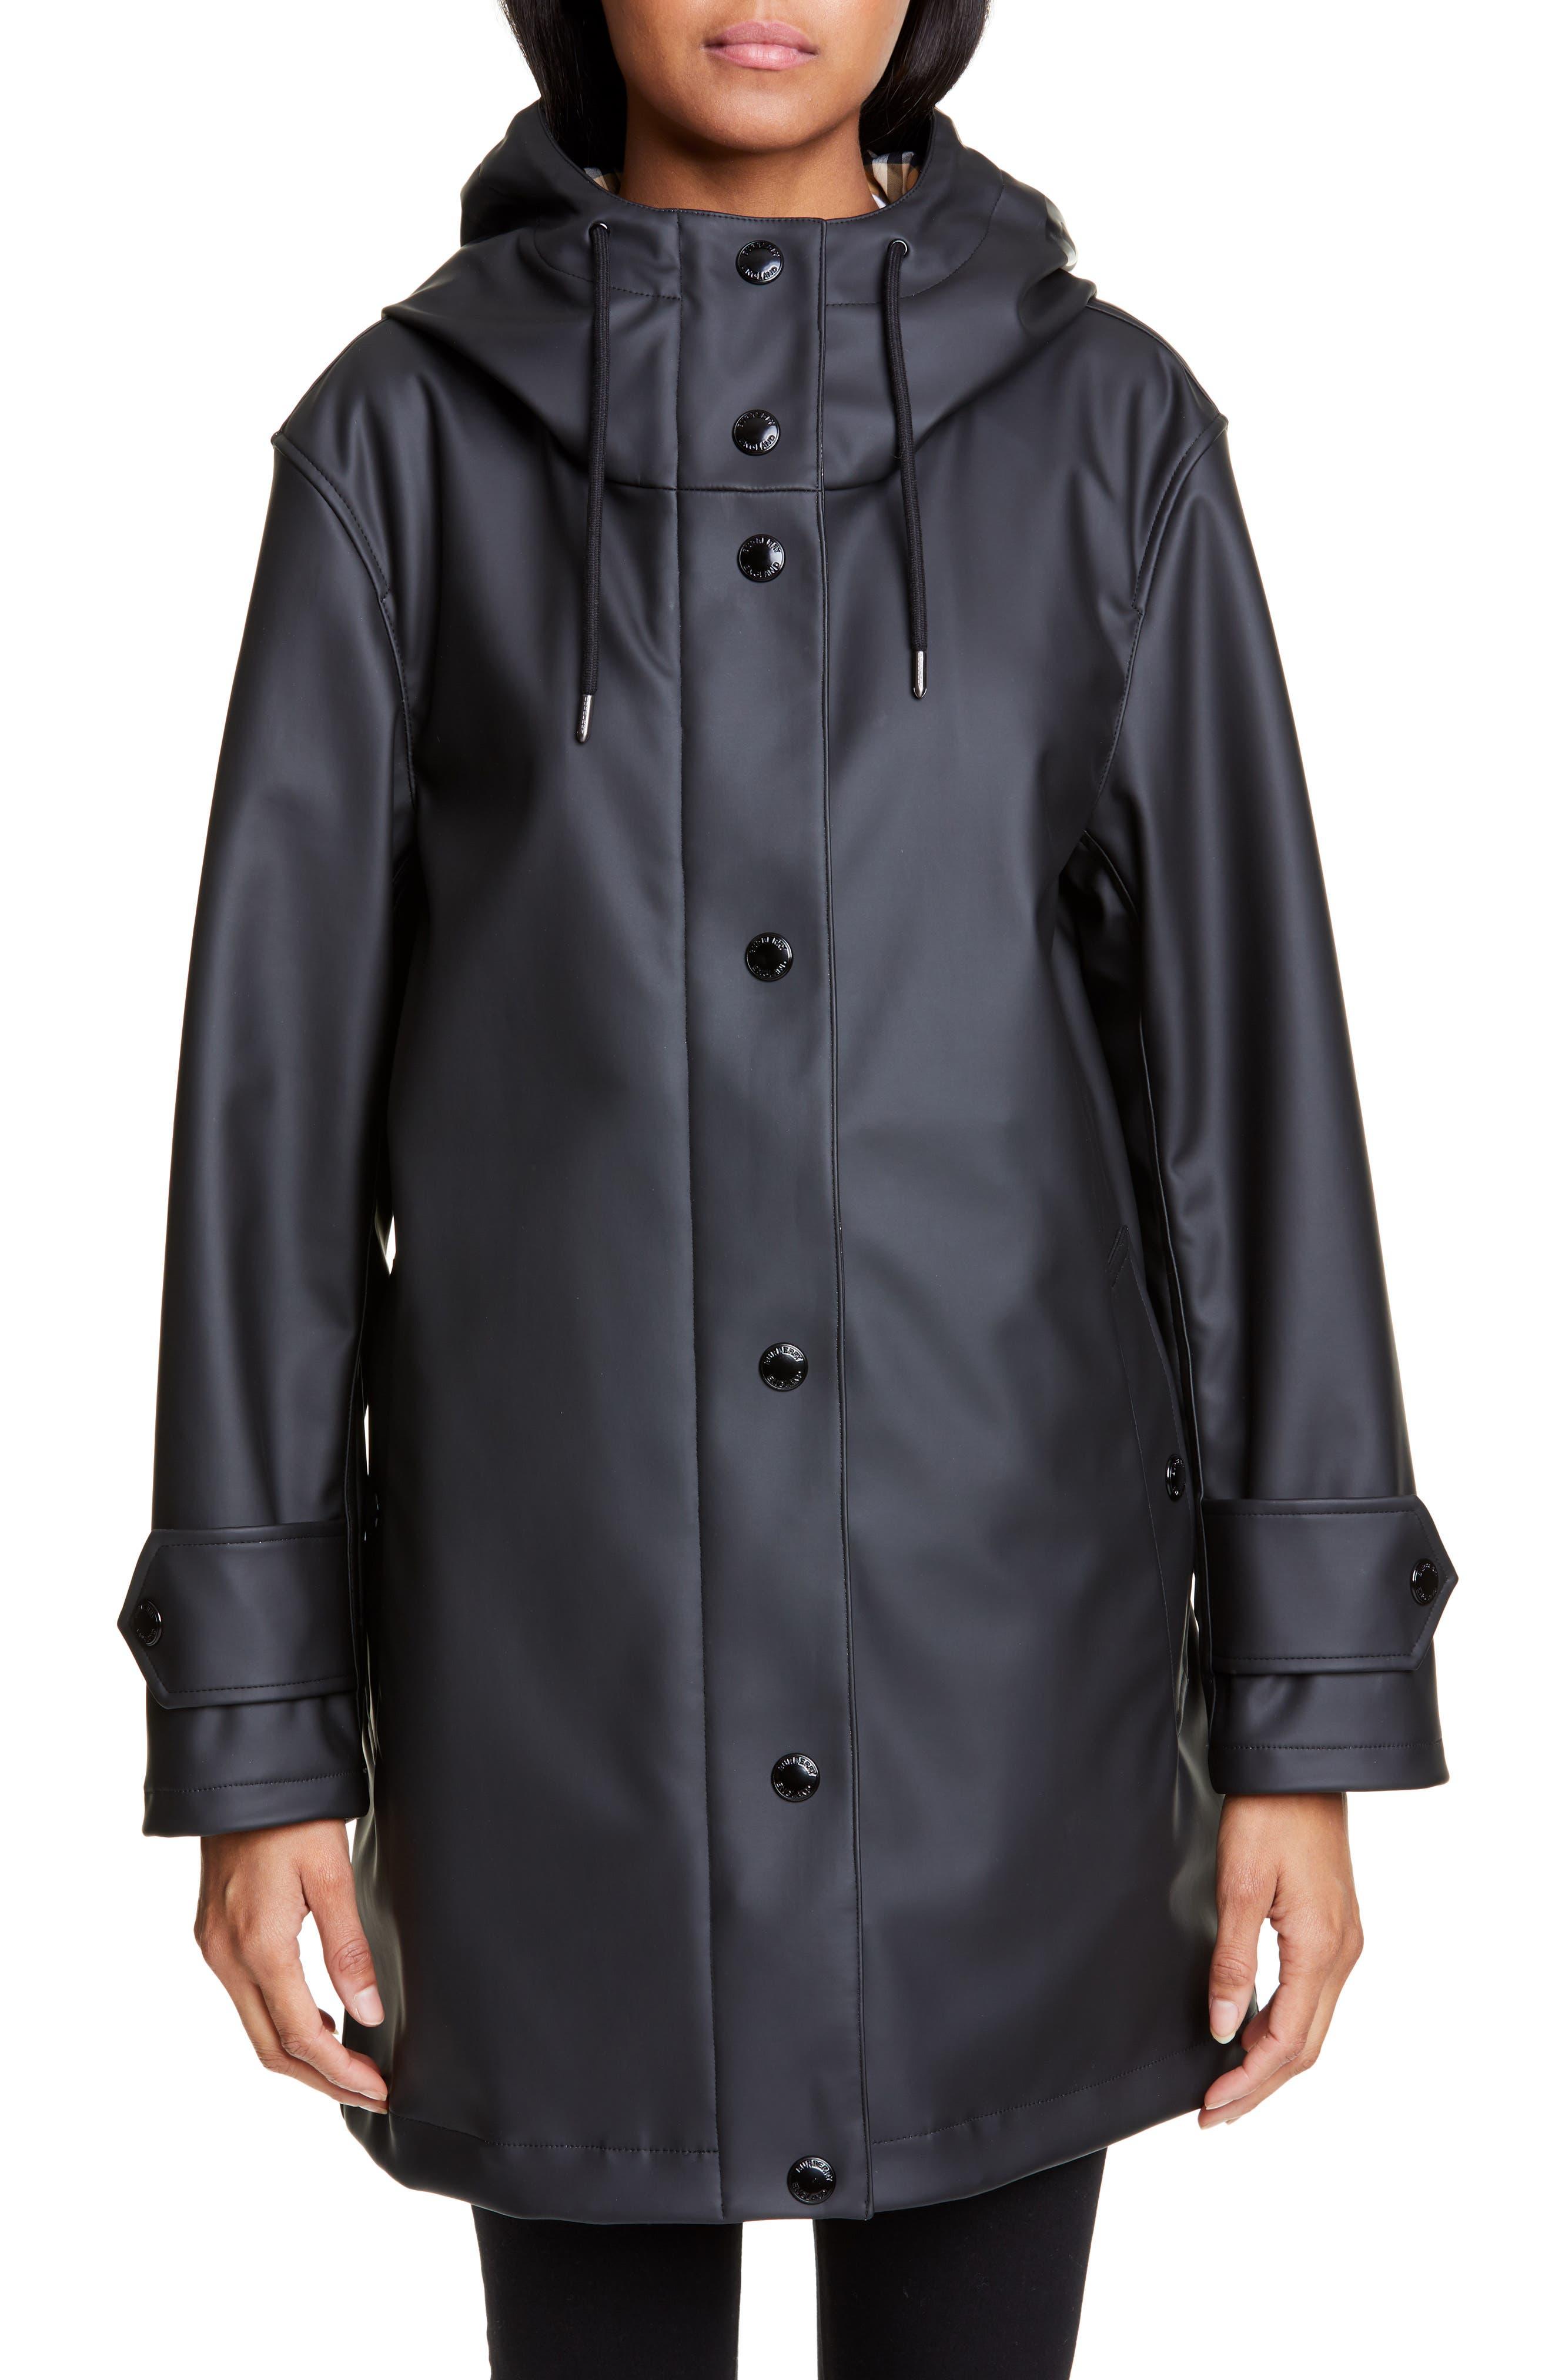 BURBERRY, Hartlebury Coated Rain Coat, Main thumbnail 1, color, BLACK / WHITE